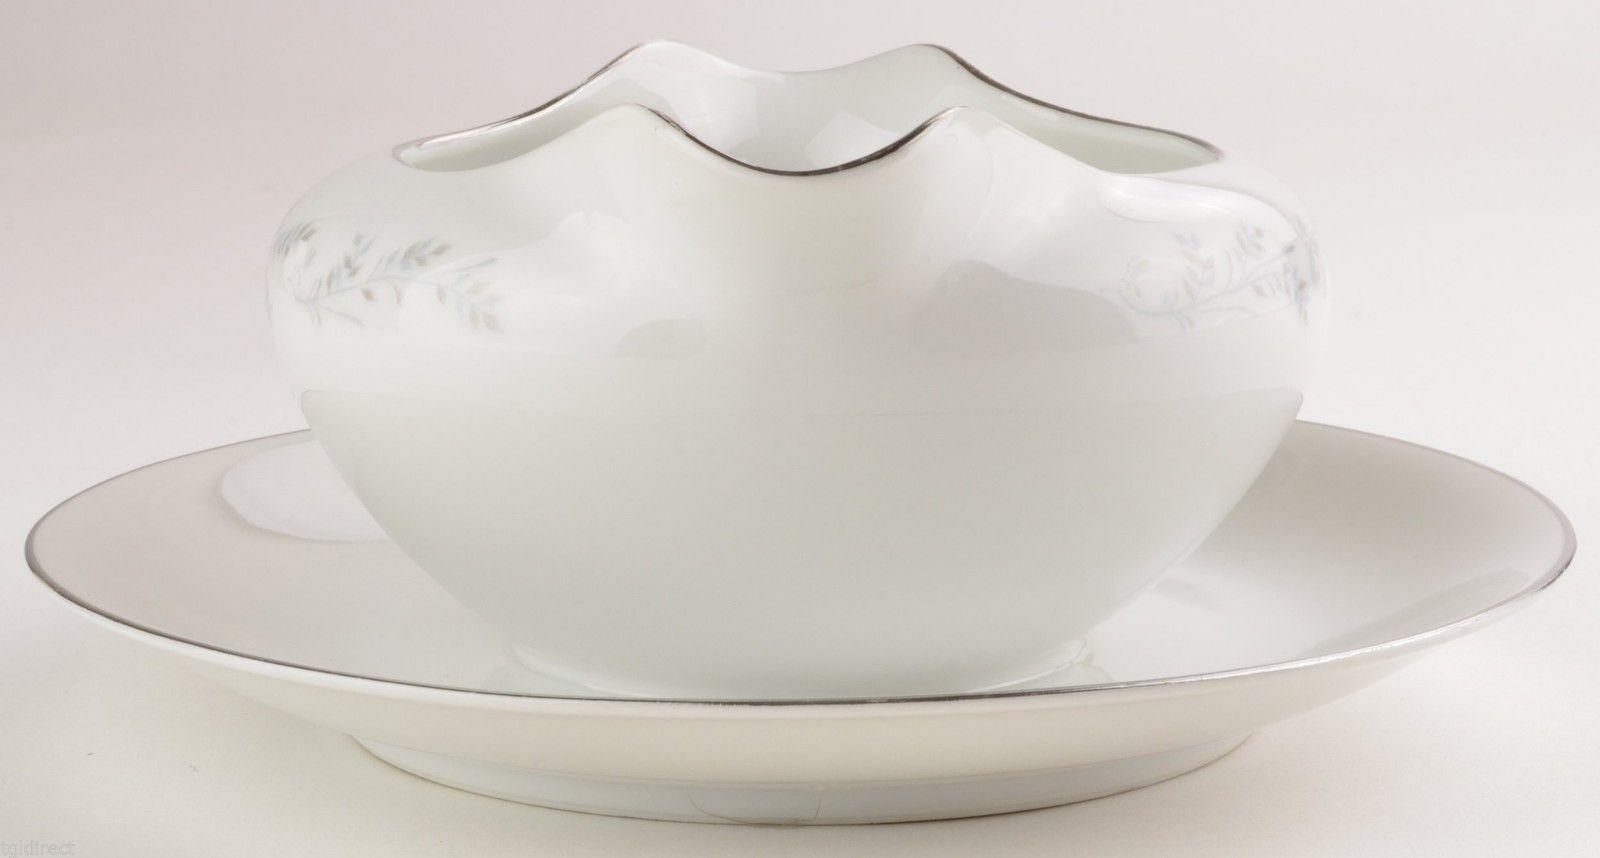 Royalton China Co. E.G. 3301 Gravy Boat & Attached Underplate Fine Porcelain